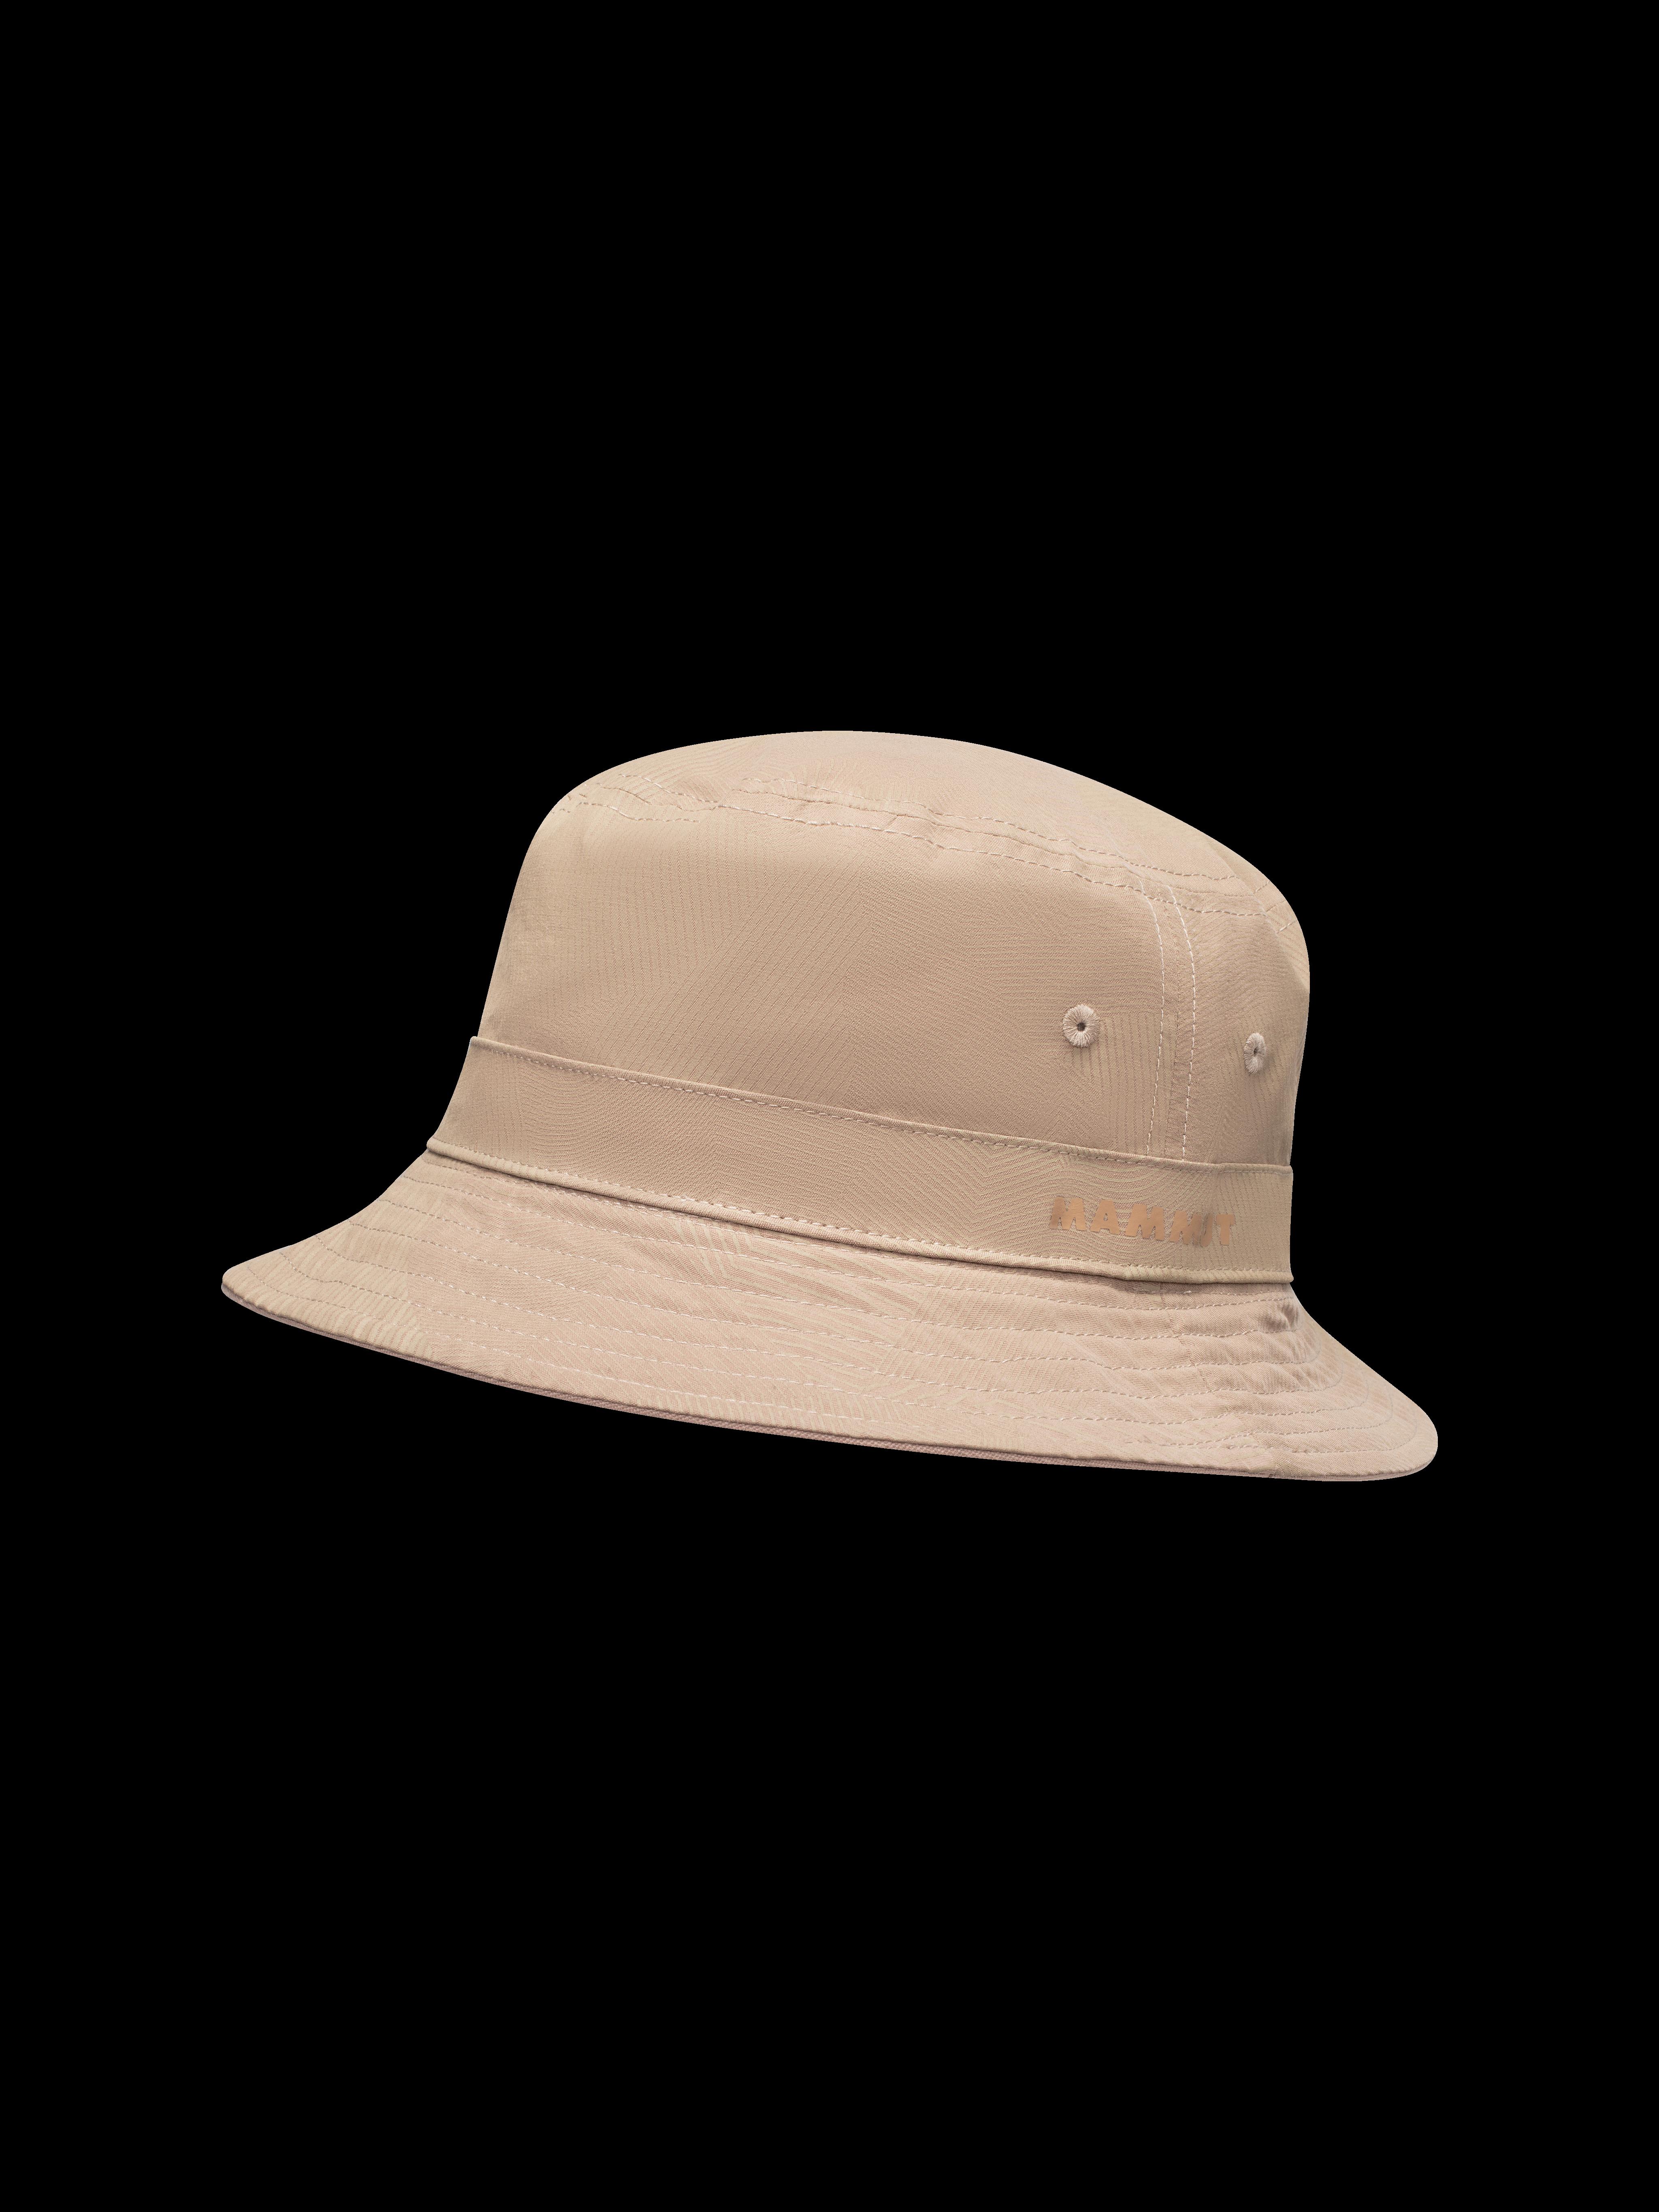 Mammut Bucket Hat product image